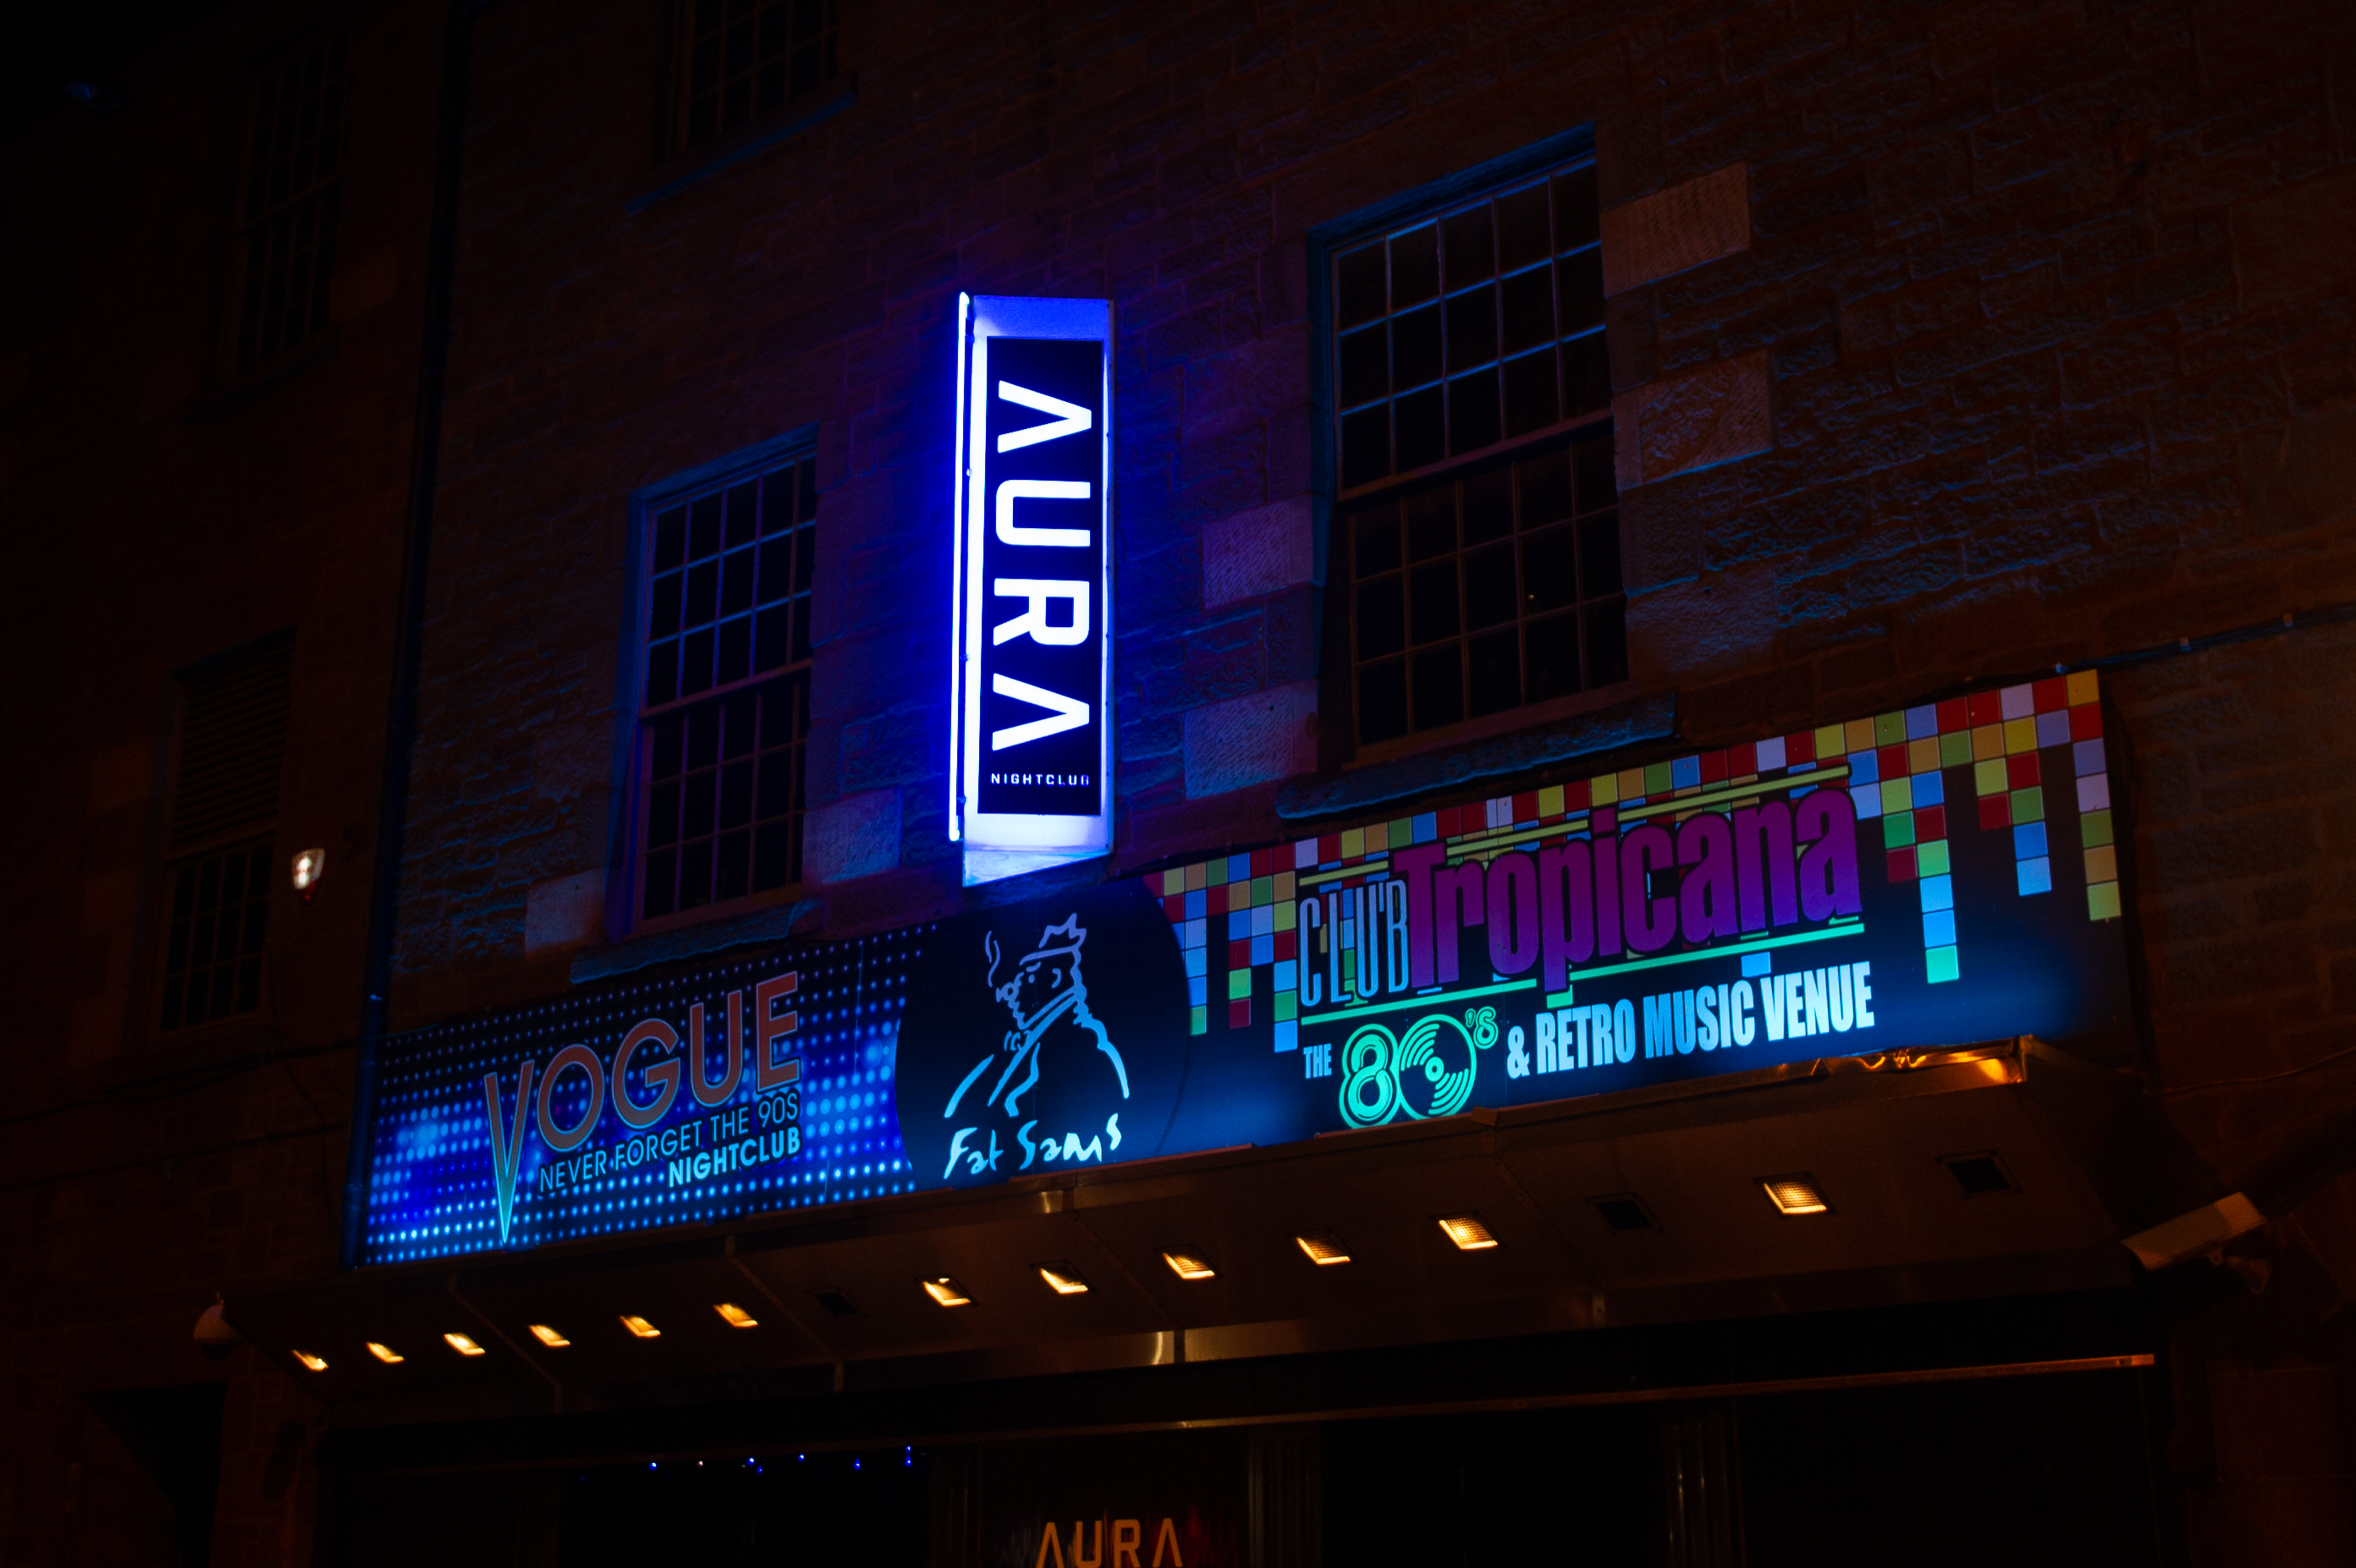 Aura nightclub in South Ward Street, Dundee.